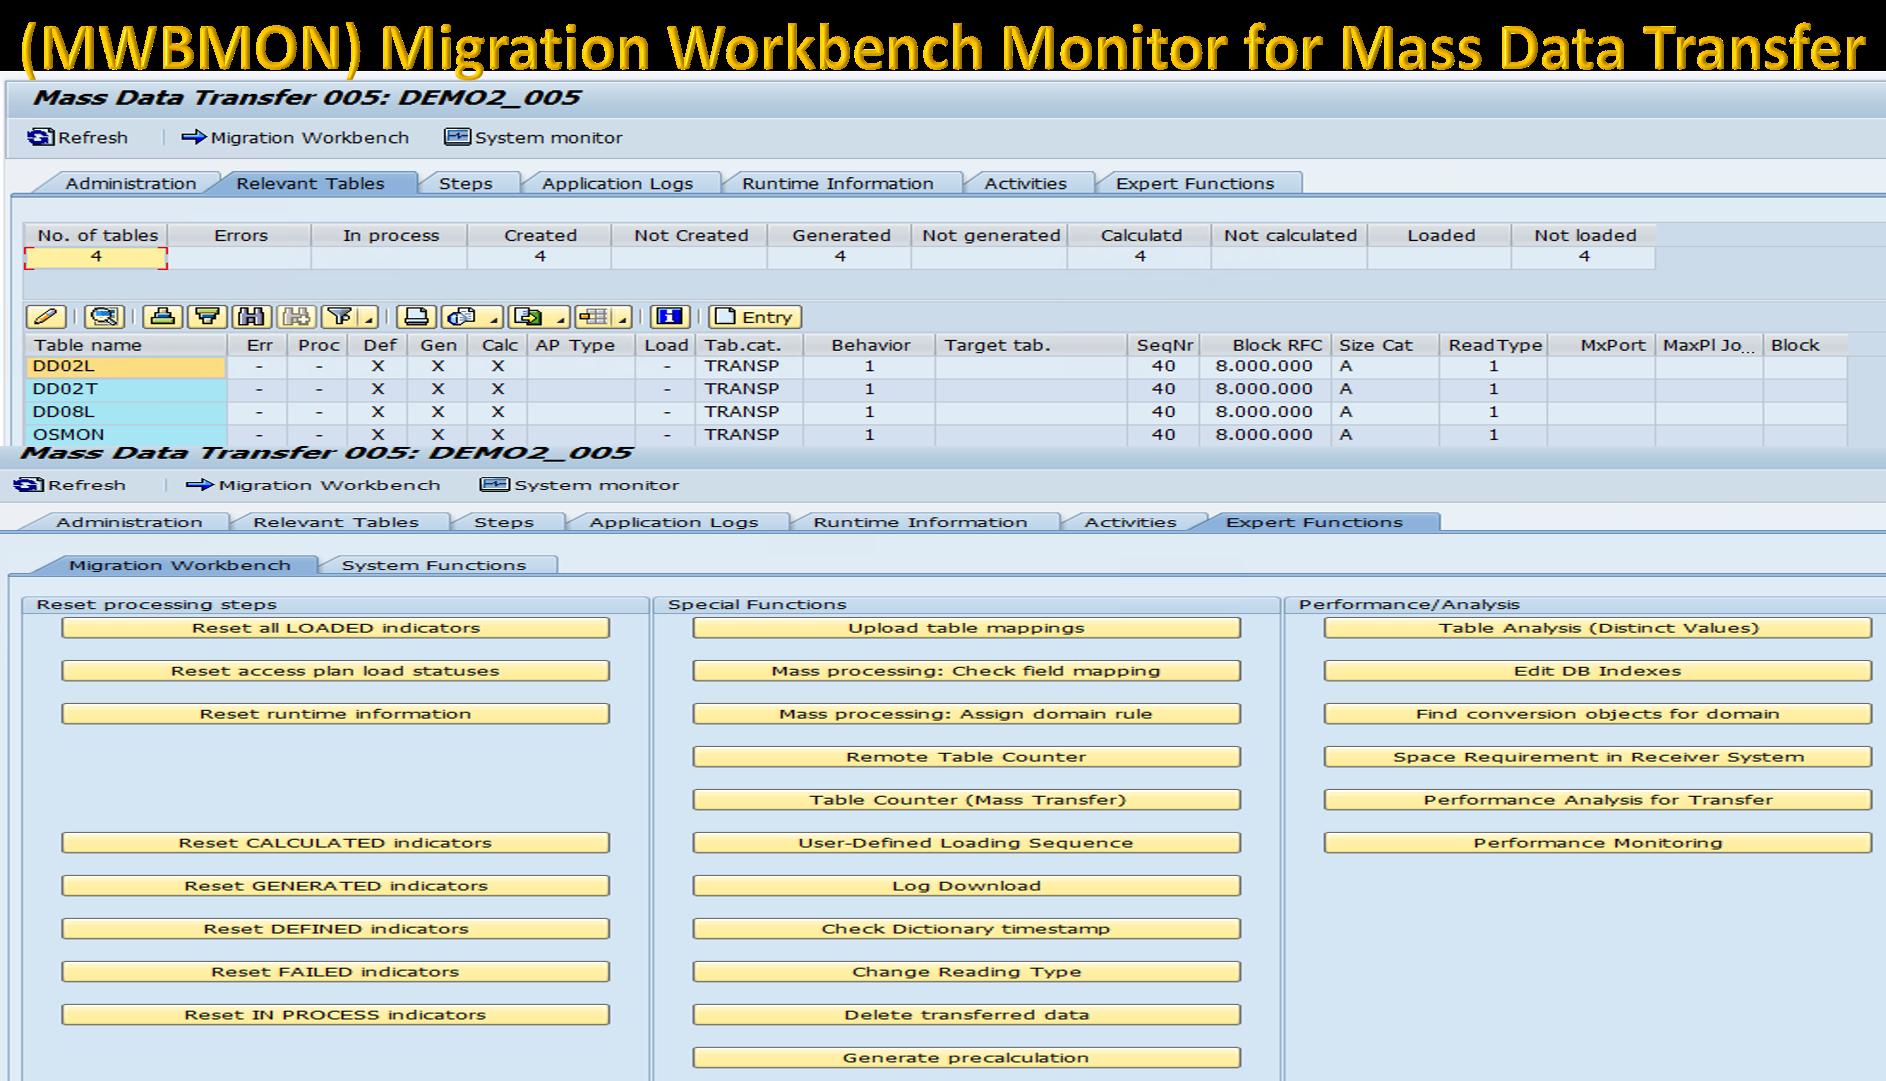 SAP Monitoring including SLT Monitoring